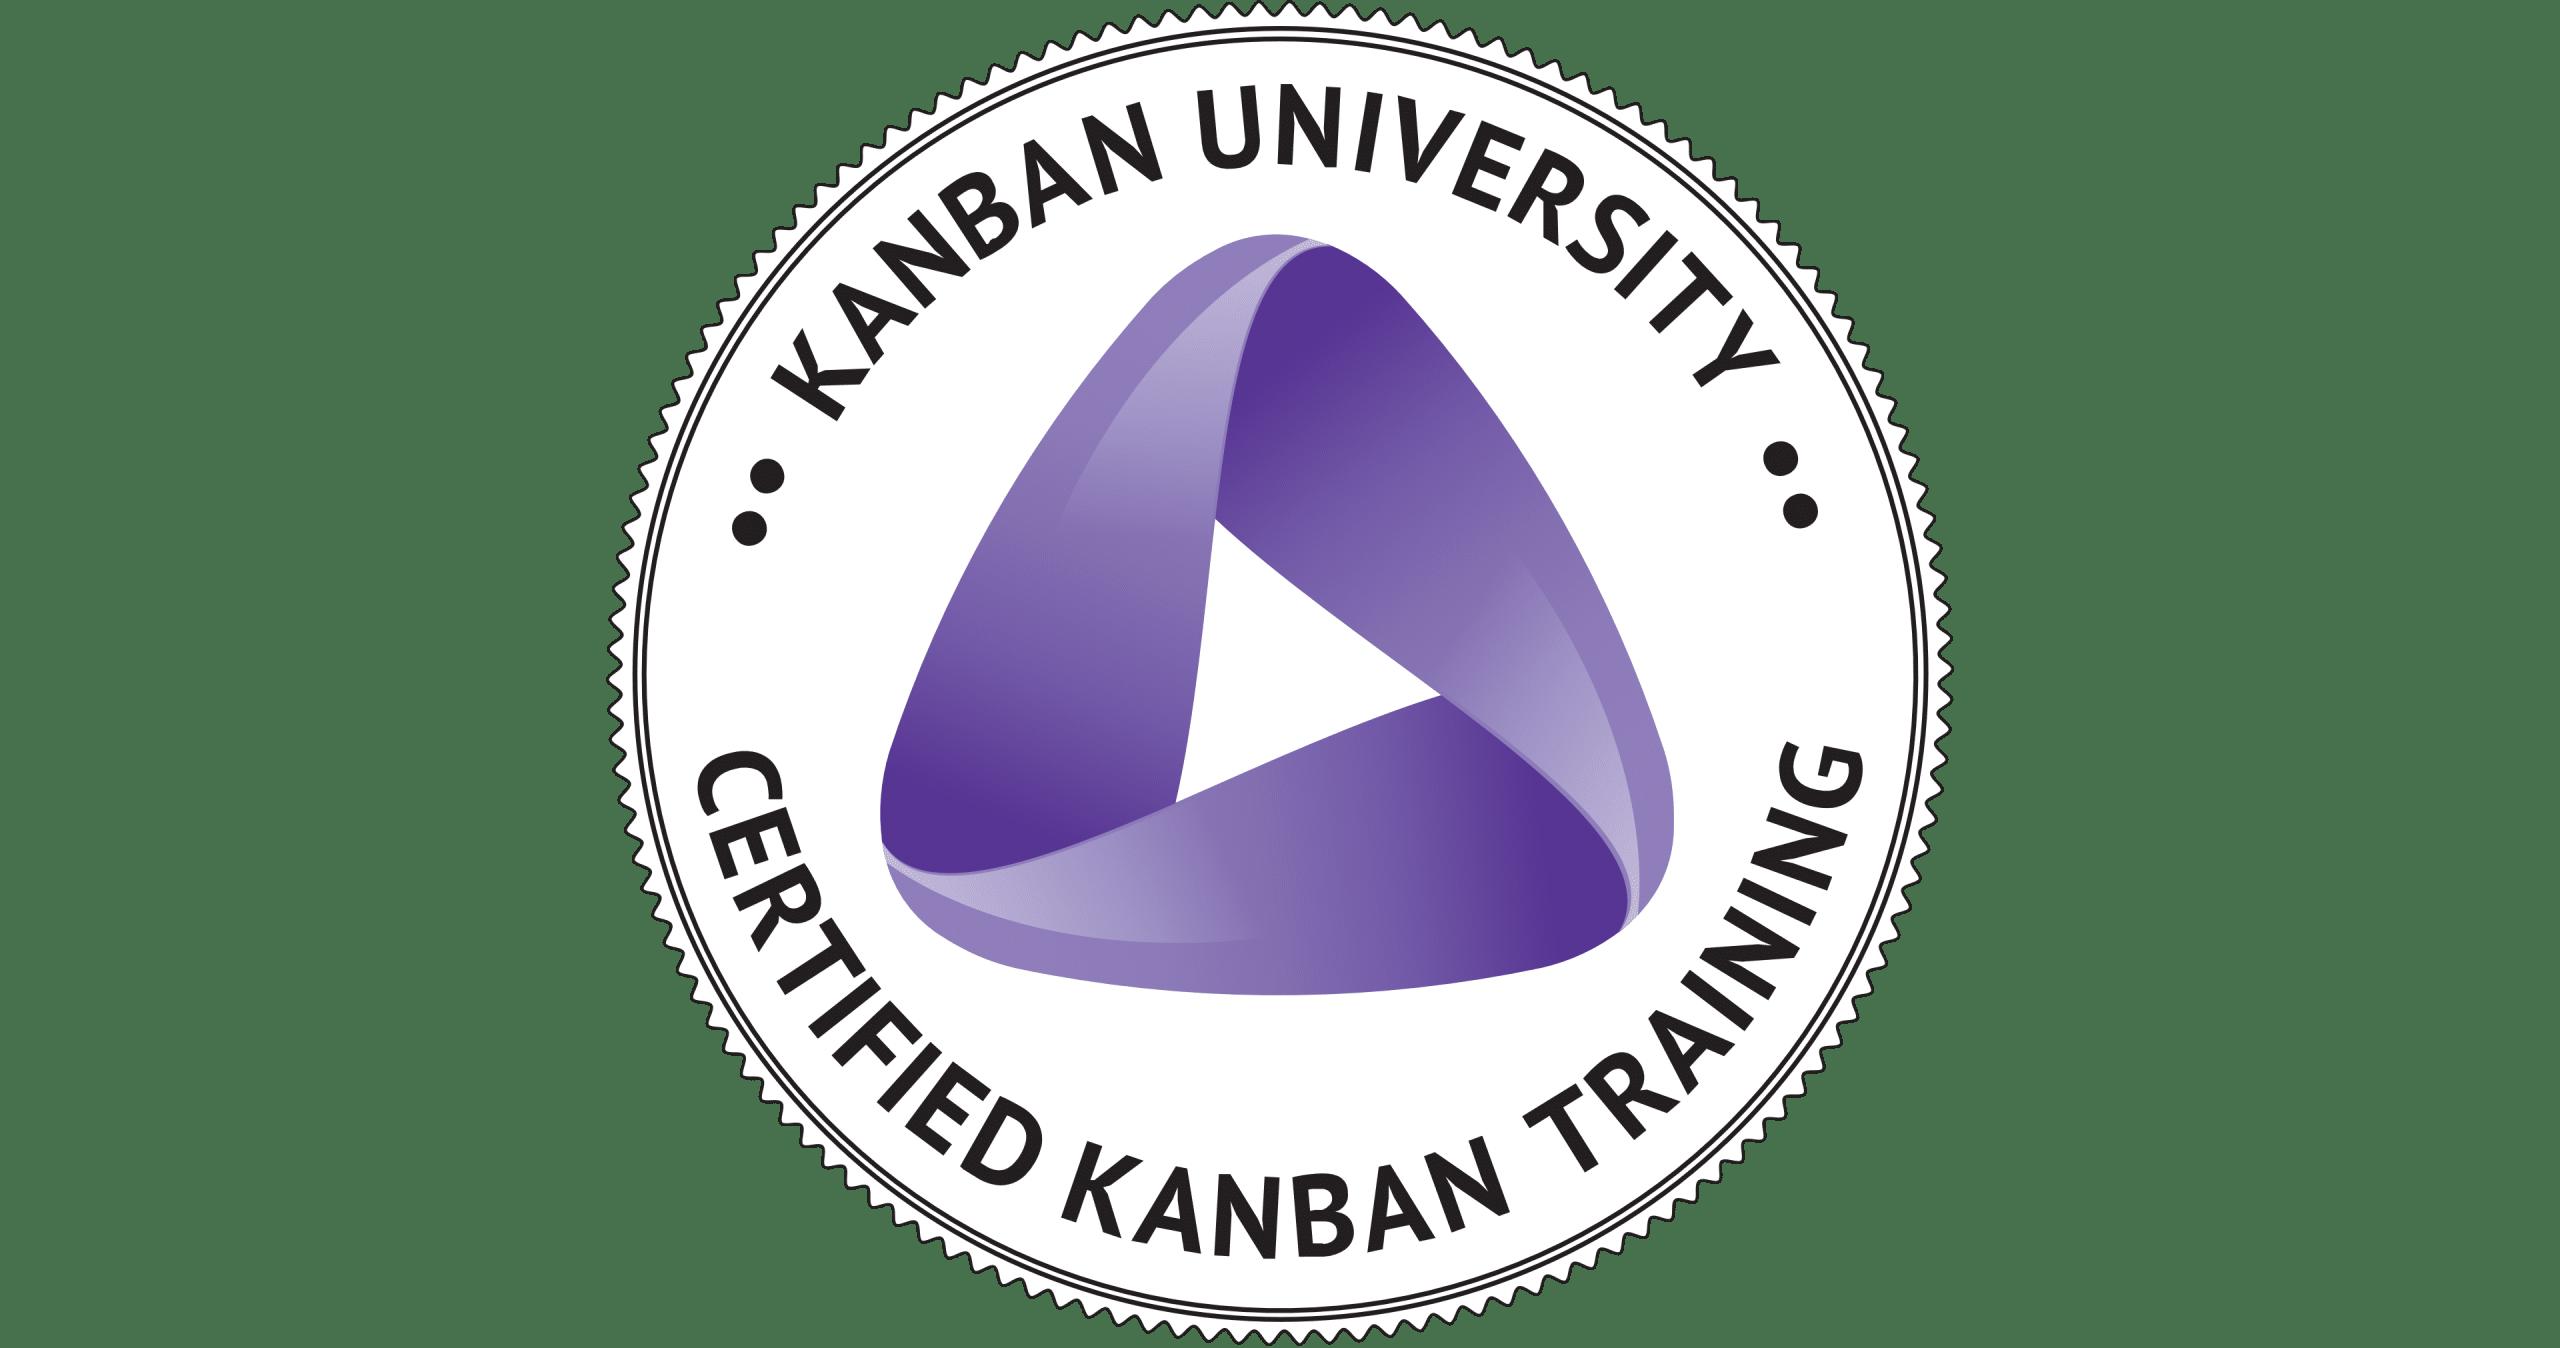 Kanban Management Professional®